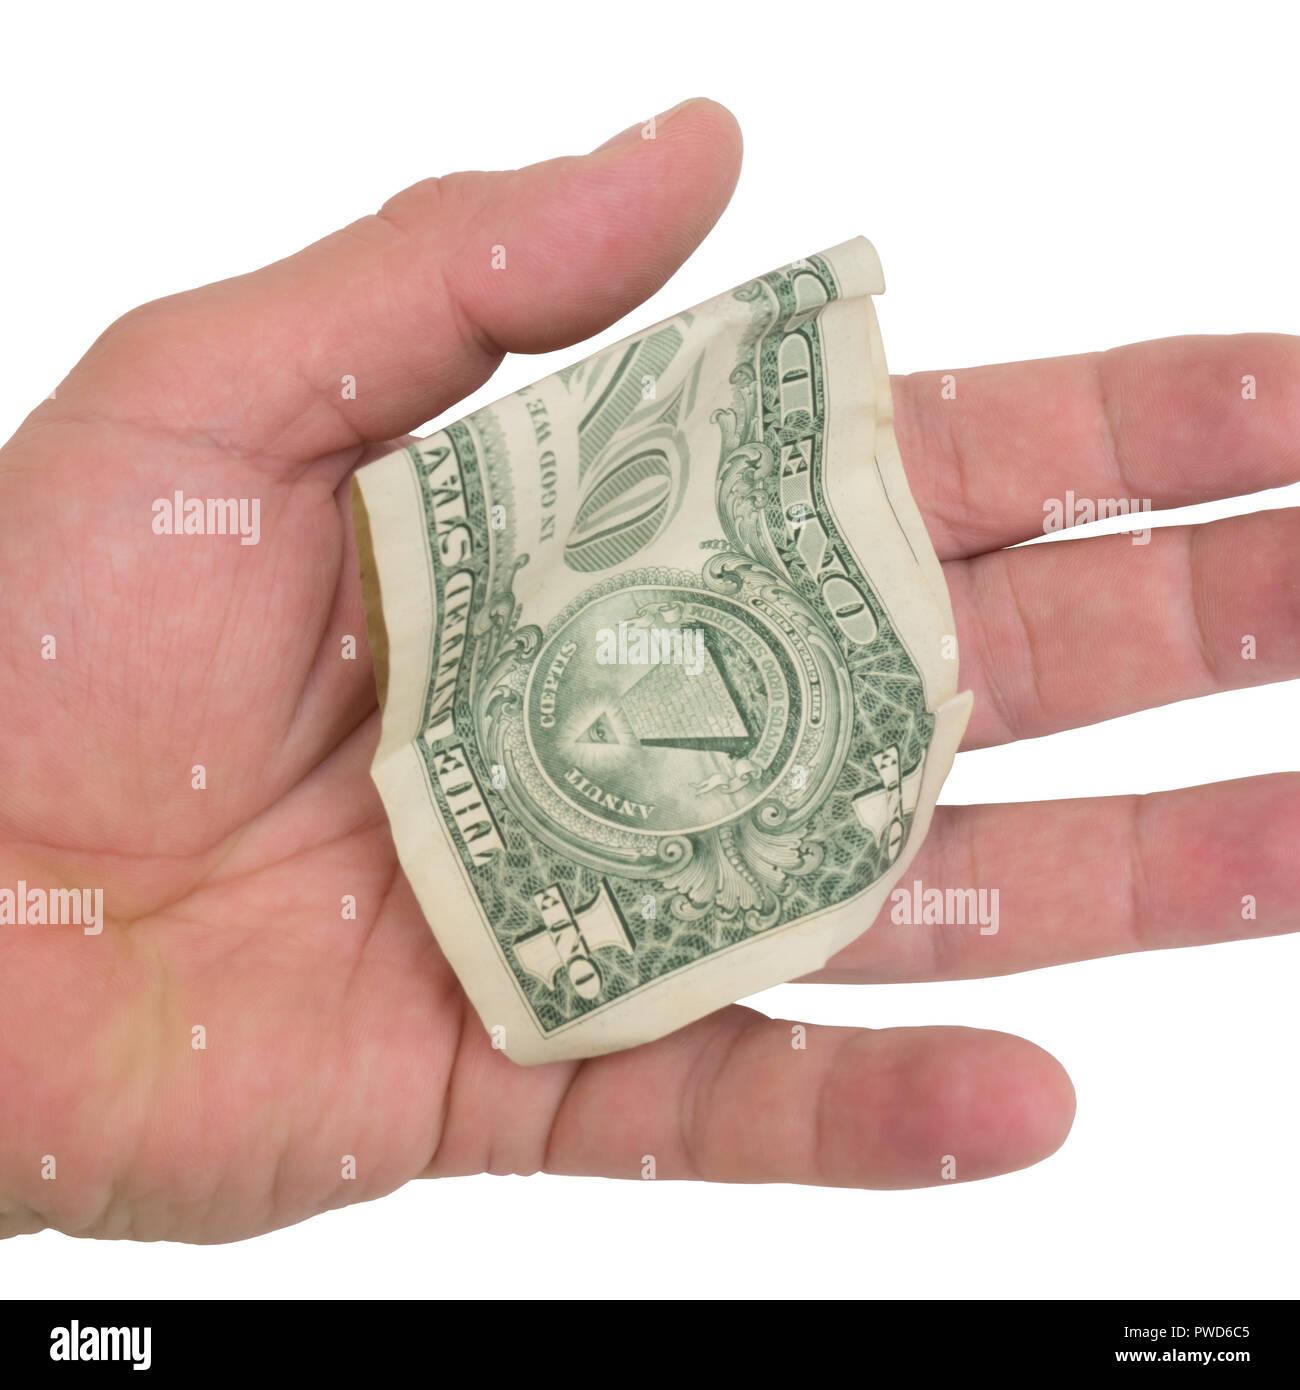 crumpled dollar bill - Stock Image